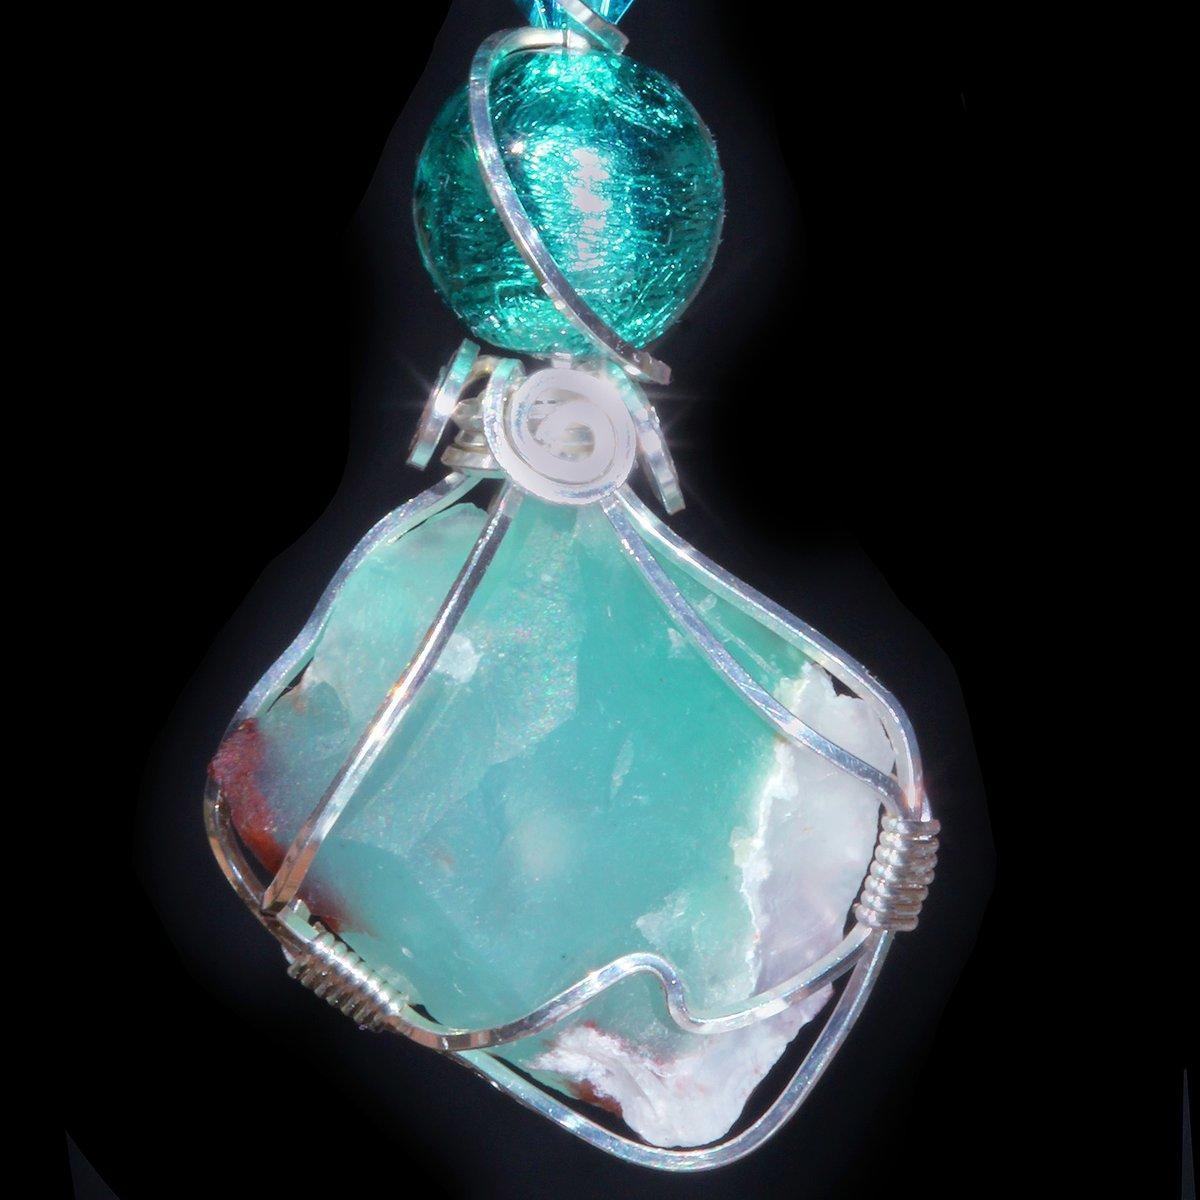 Aquaprase Blue Green Chalcedony Handmade Pendant